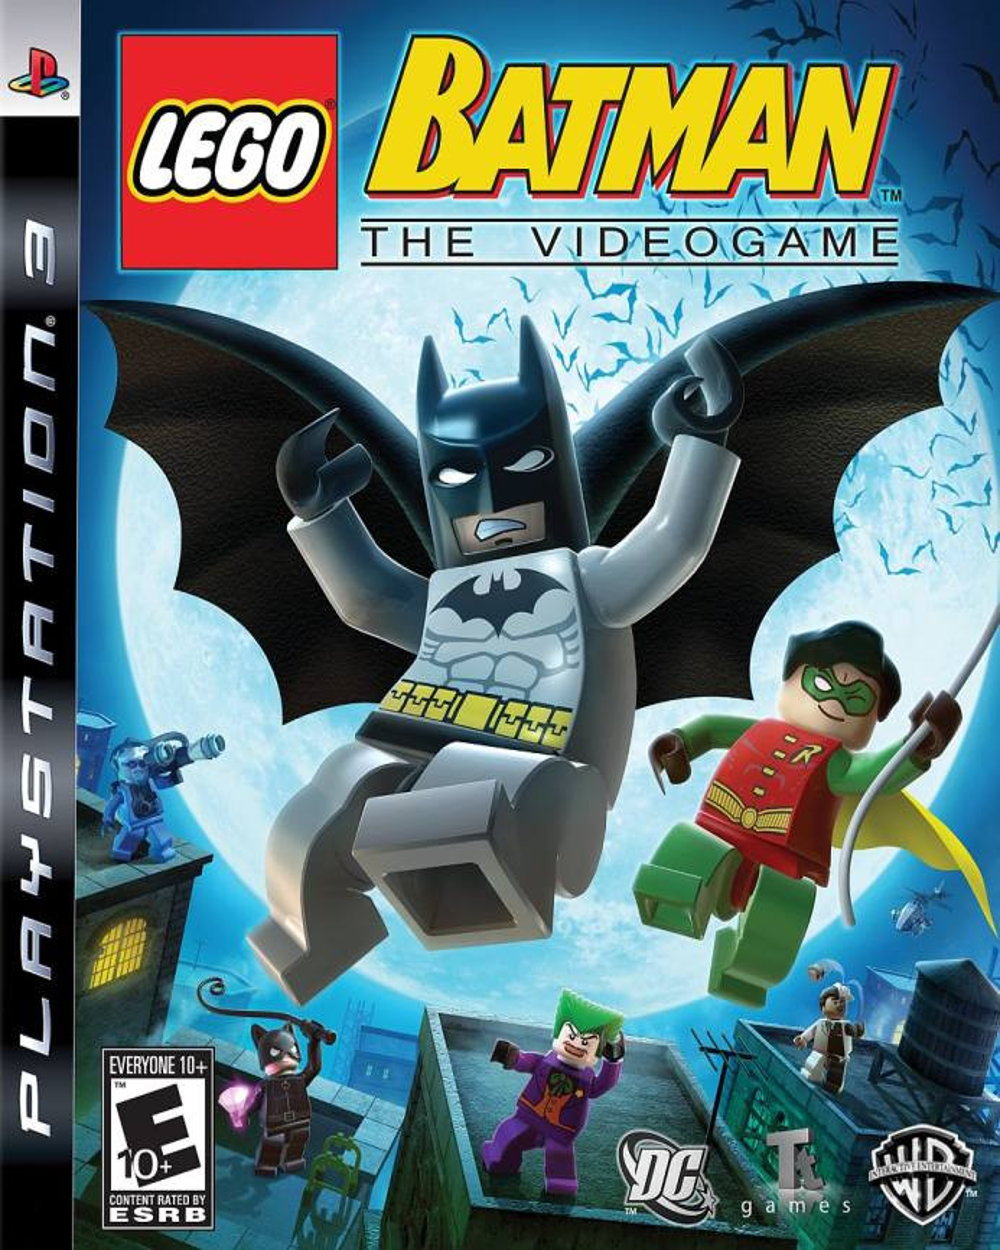 PS3 Lego Batman - The Video Game